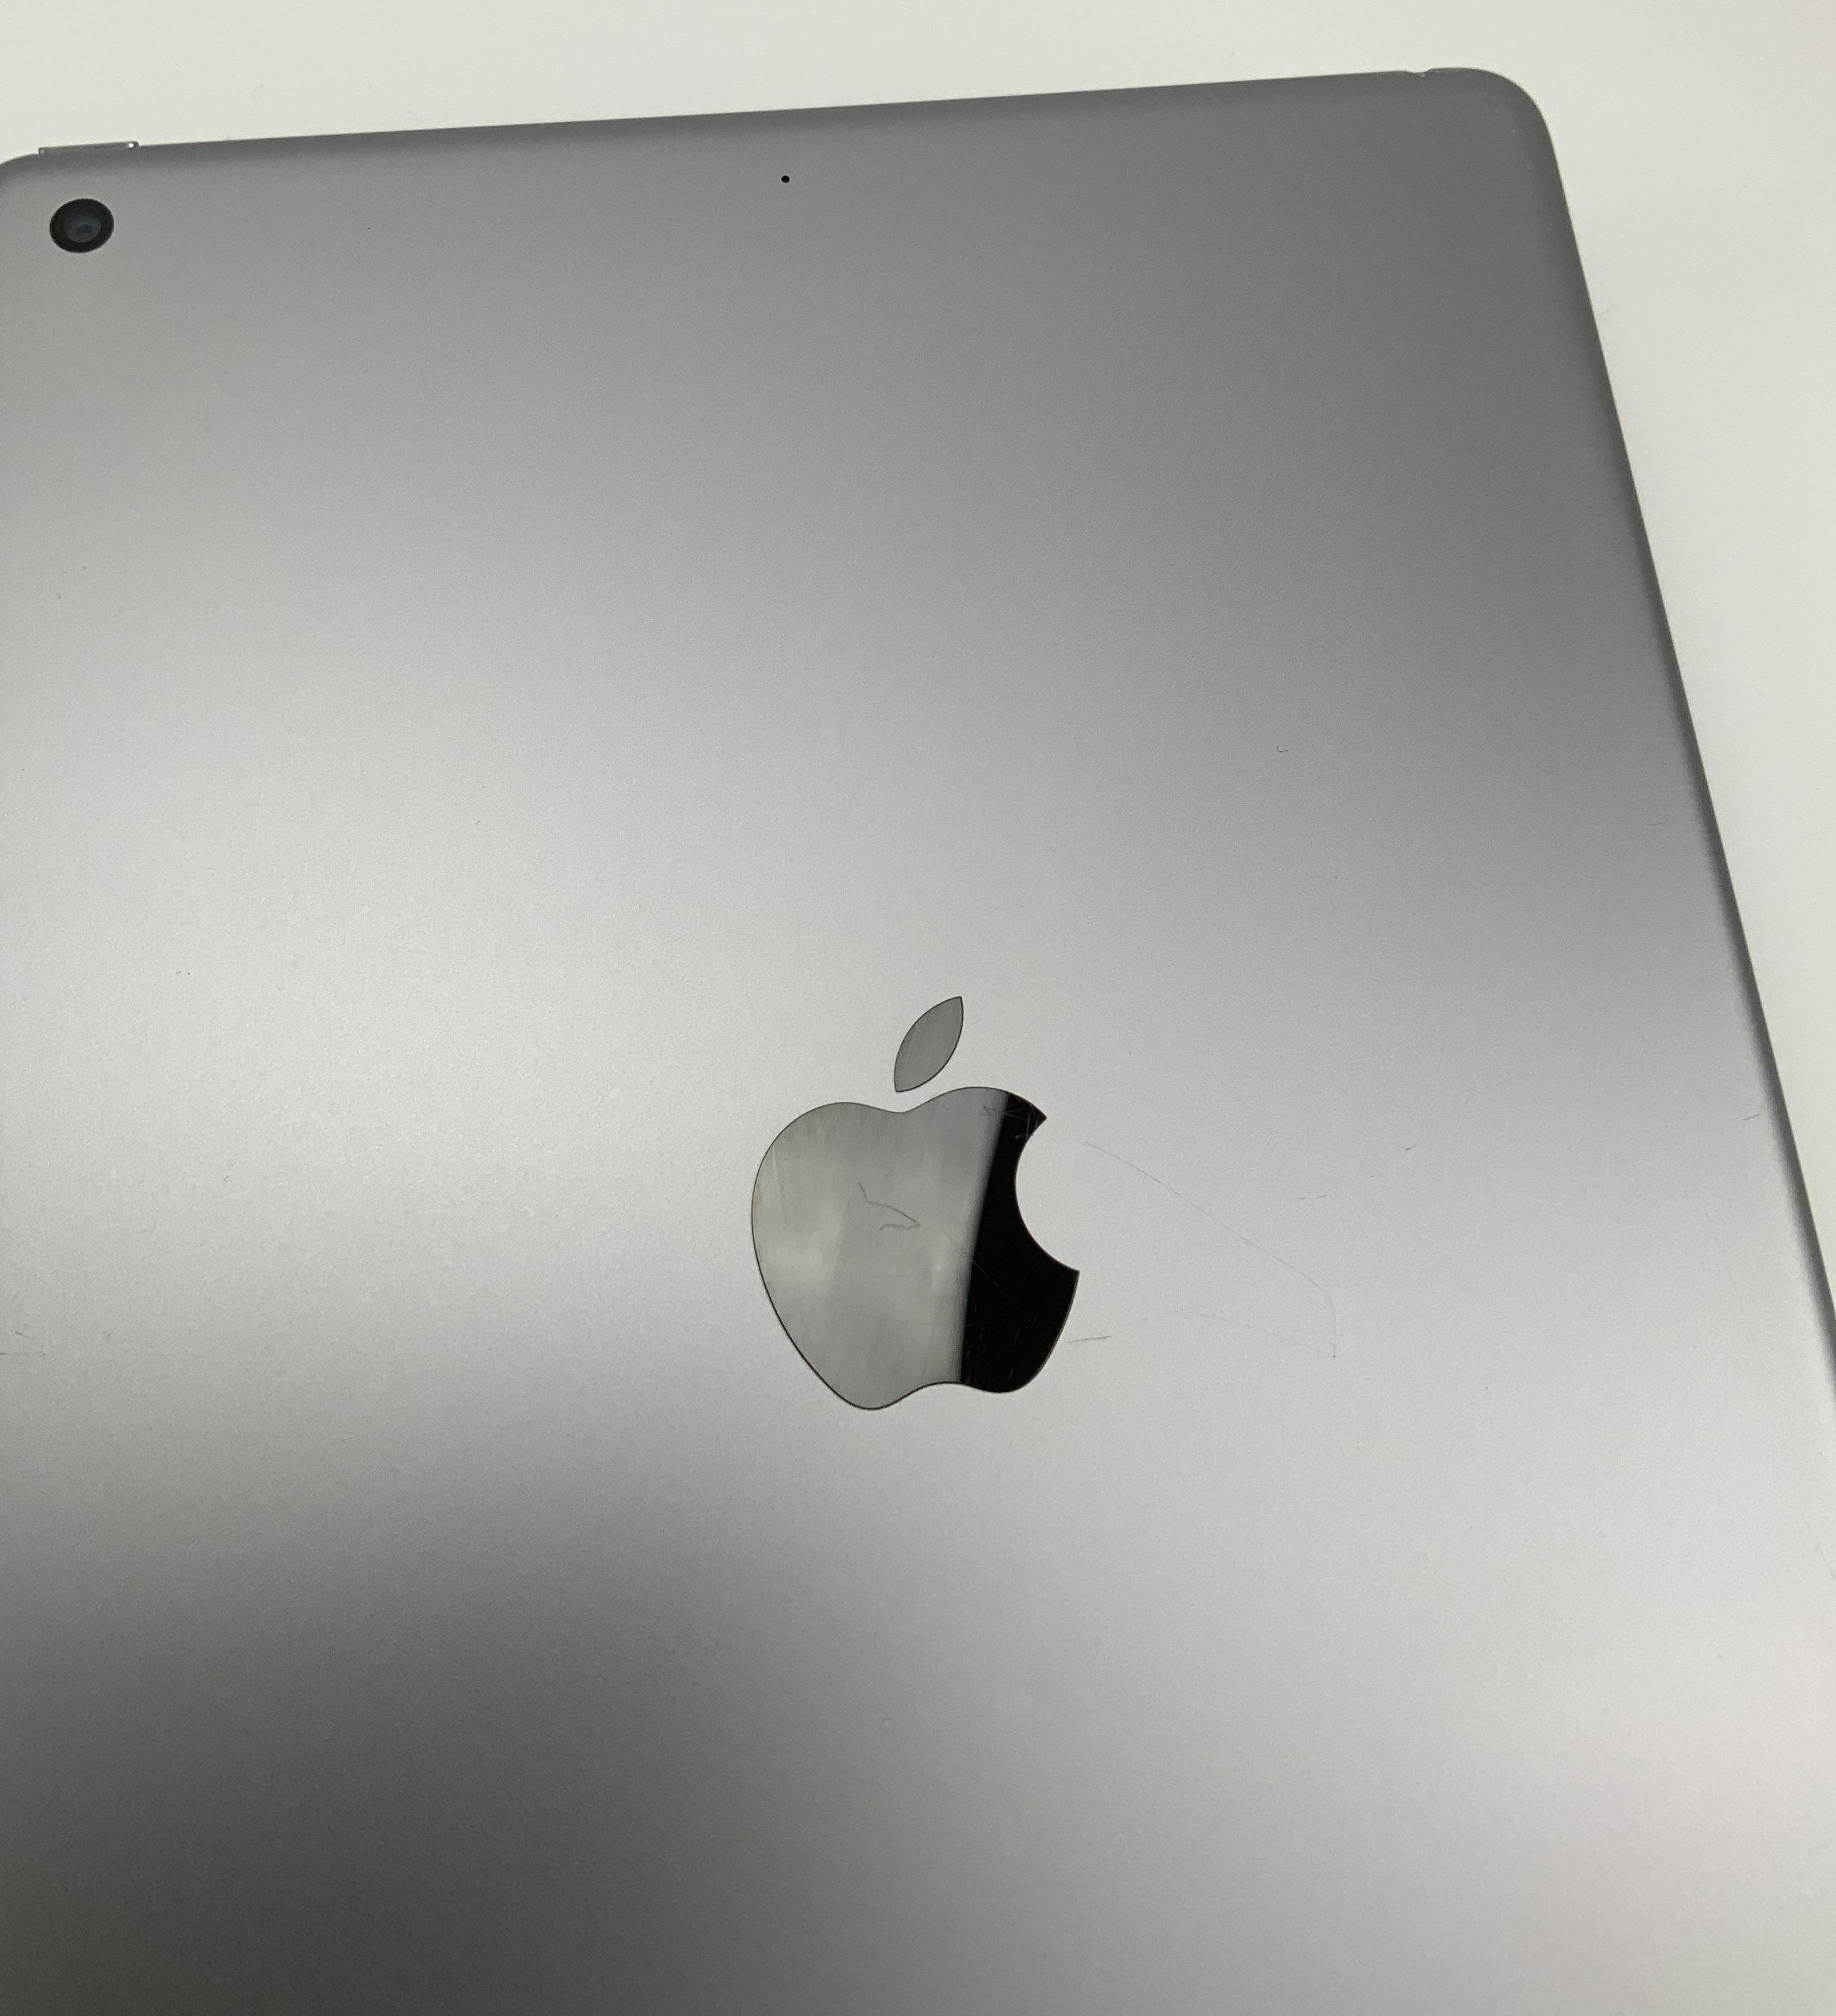 iPad 5 Wi-Fi 128GB, 128GB, Space Gray, bild 3